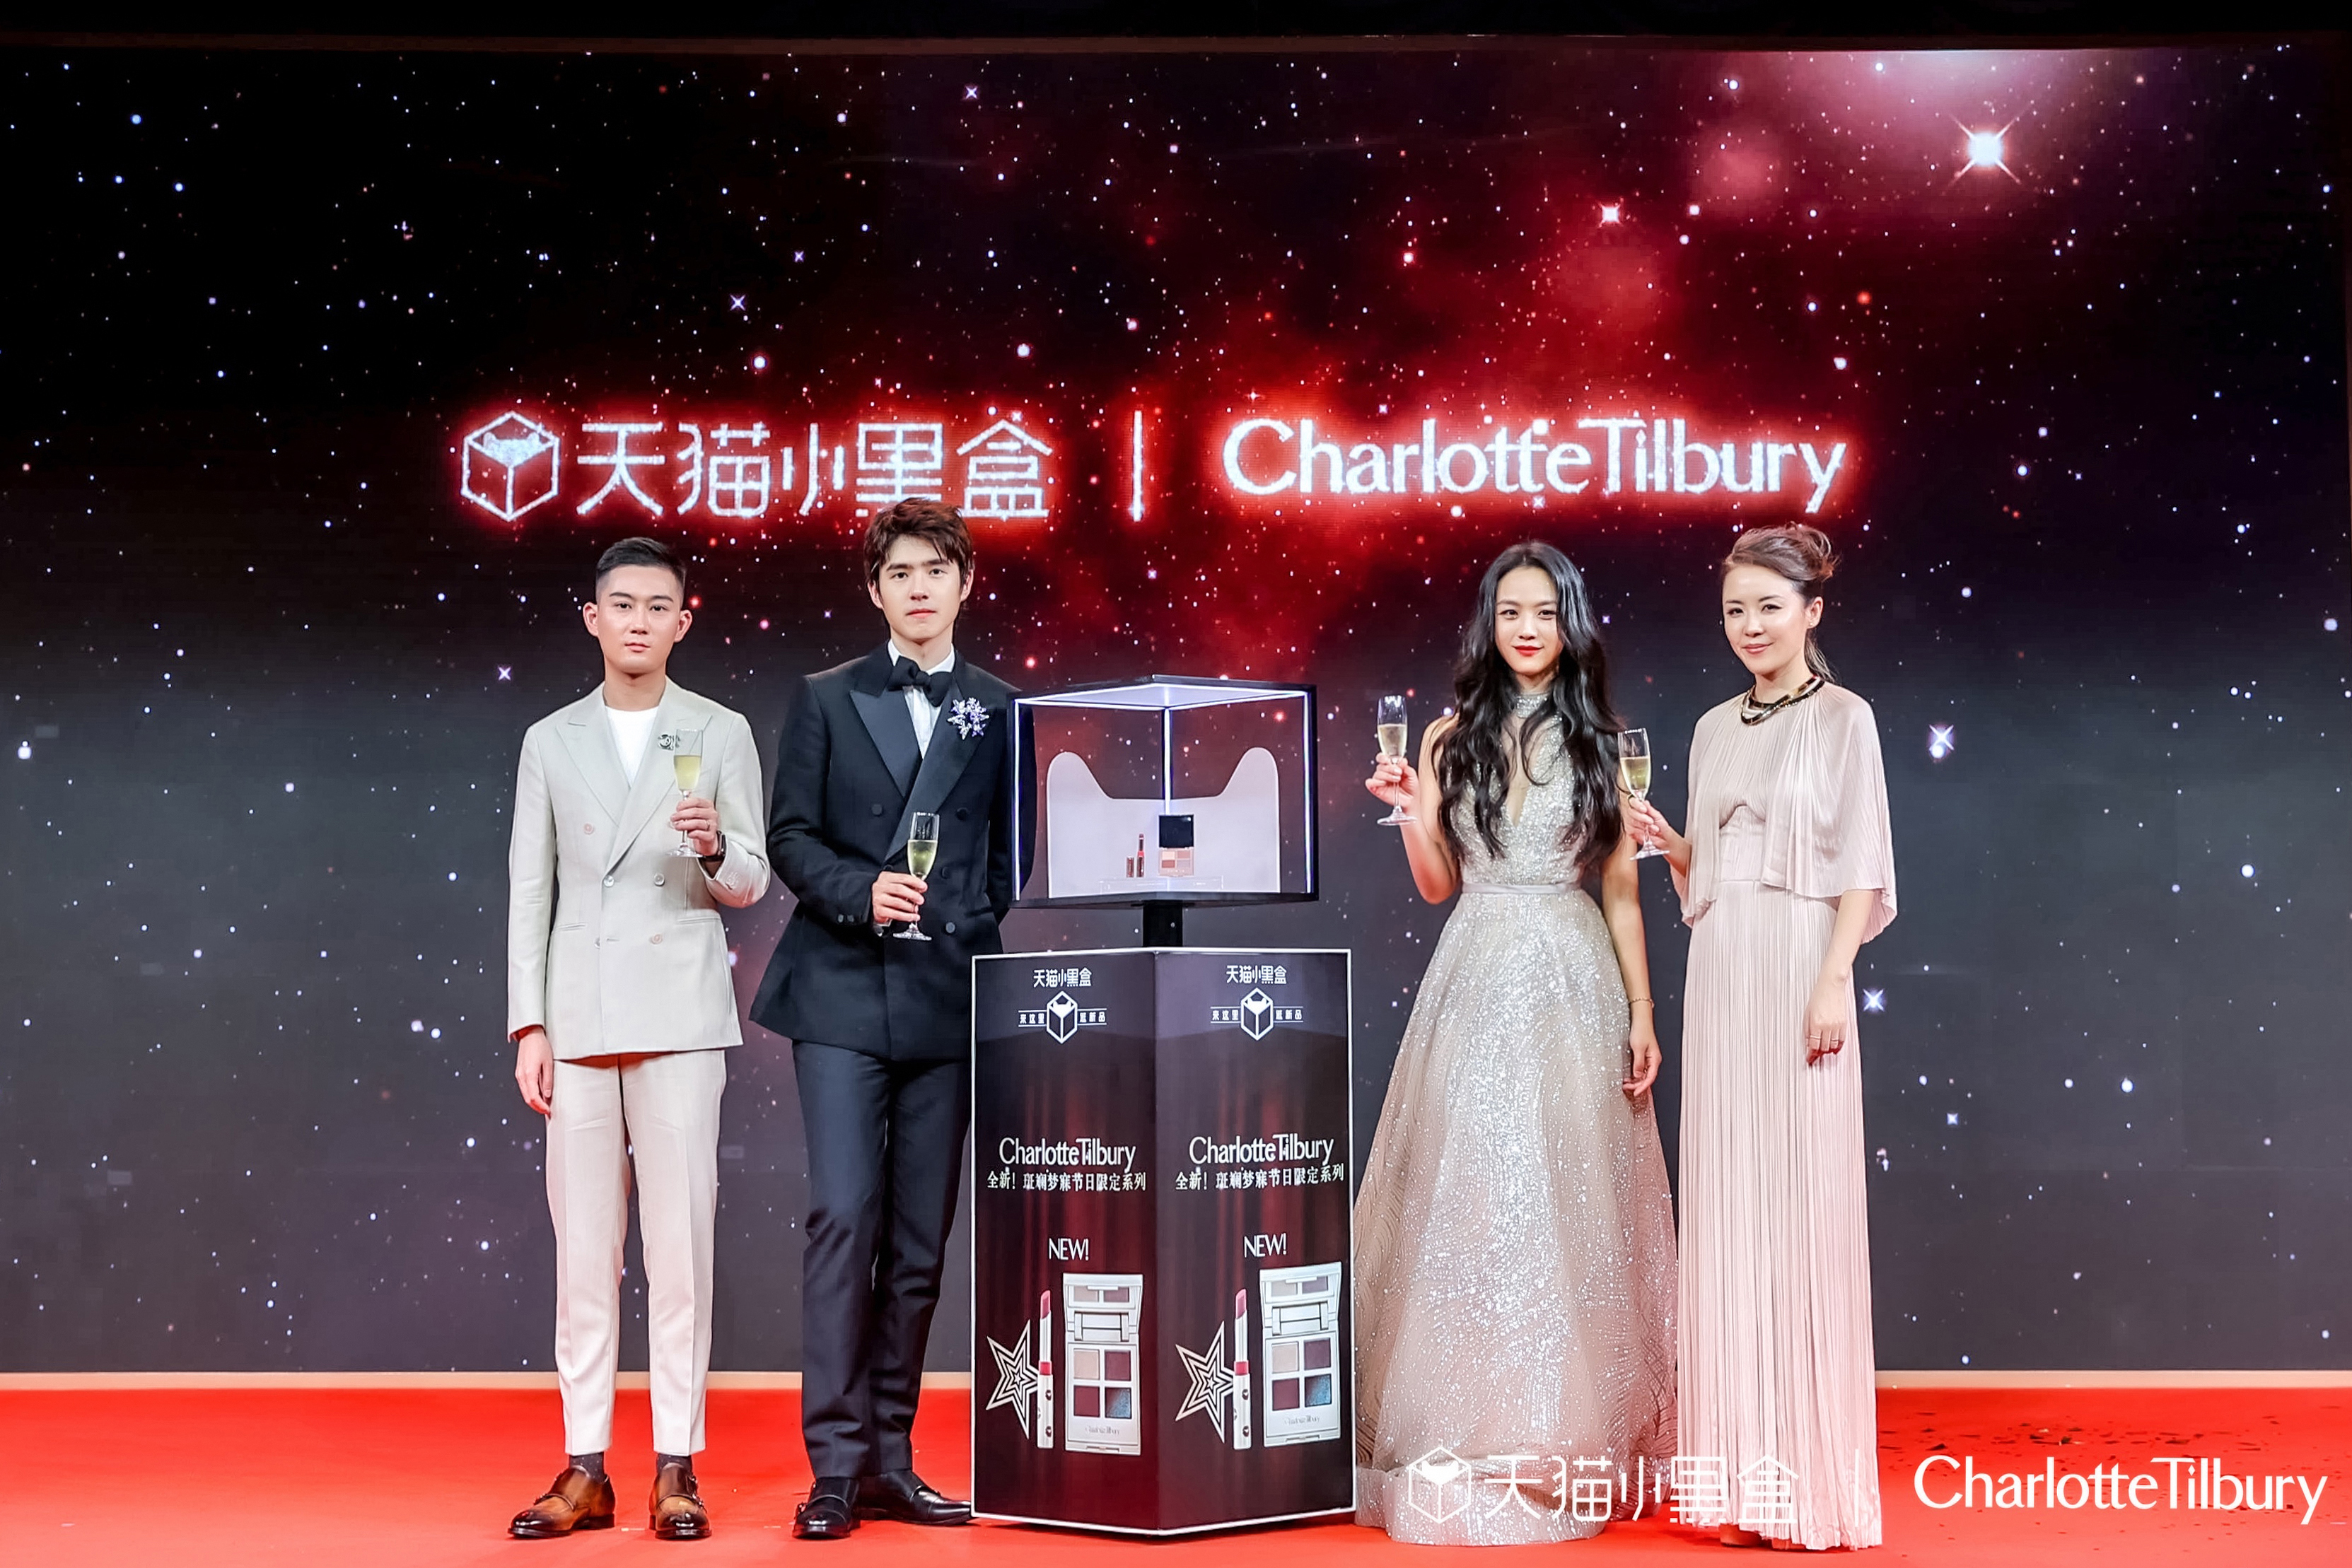 CHARLOTTE TILBURY携手全球彩妆代言人汤唯和刘昊然 宣布品牌正式进驻中国大陆插图(22)